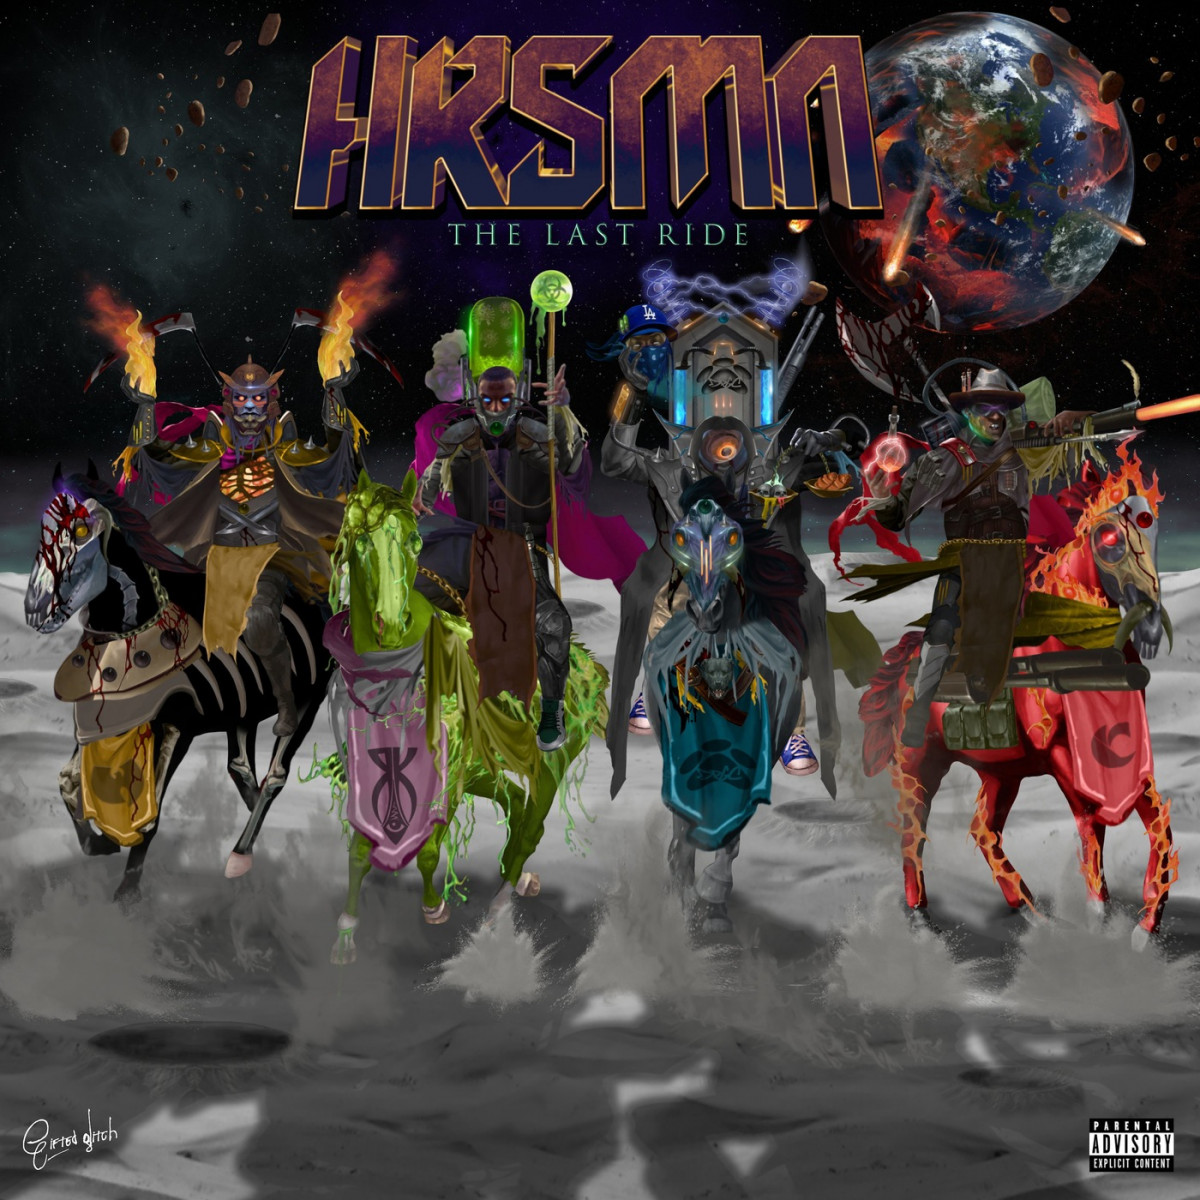 HRSMN (Canibus, Kurupt, Killah Priest & Ras Kass) — «The Last Ride»